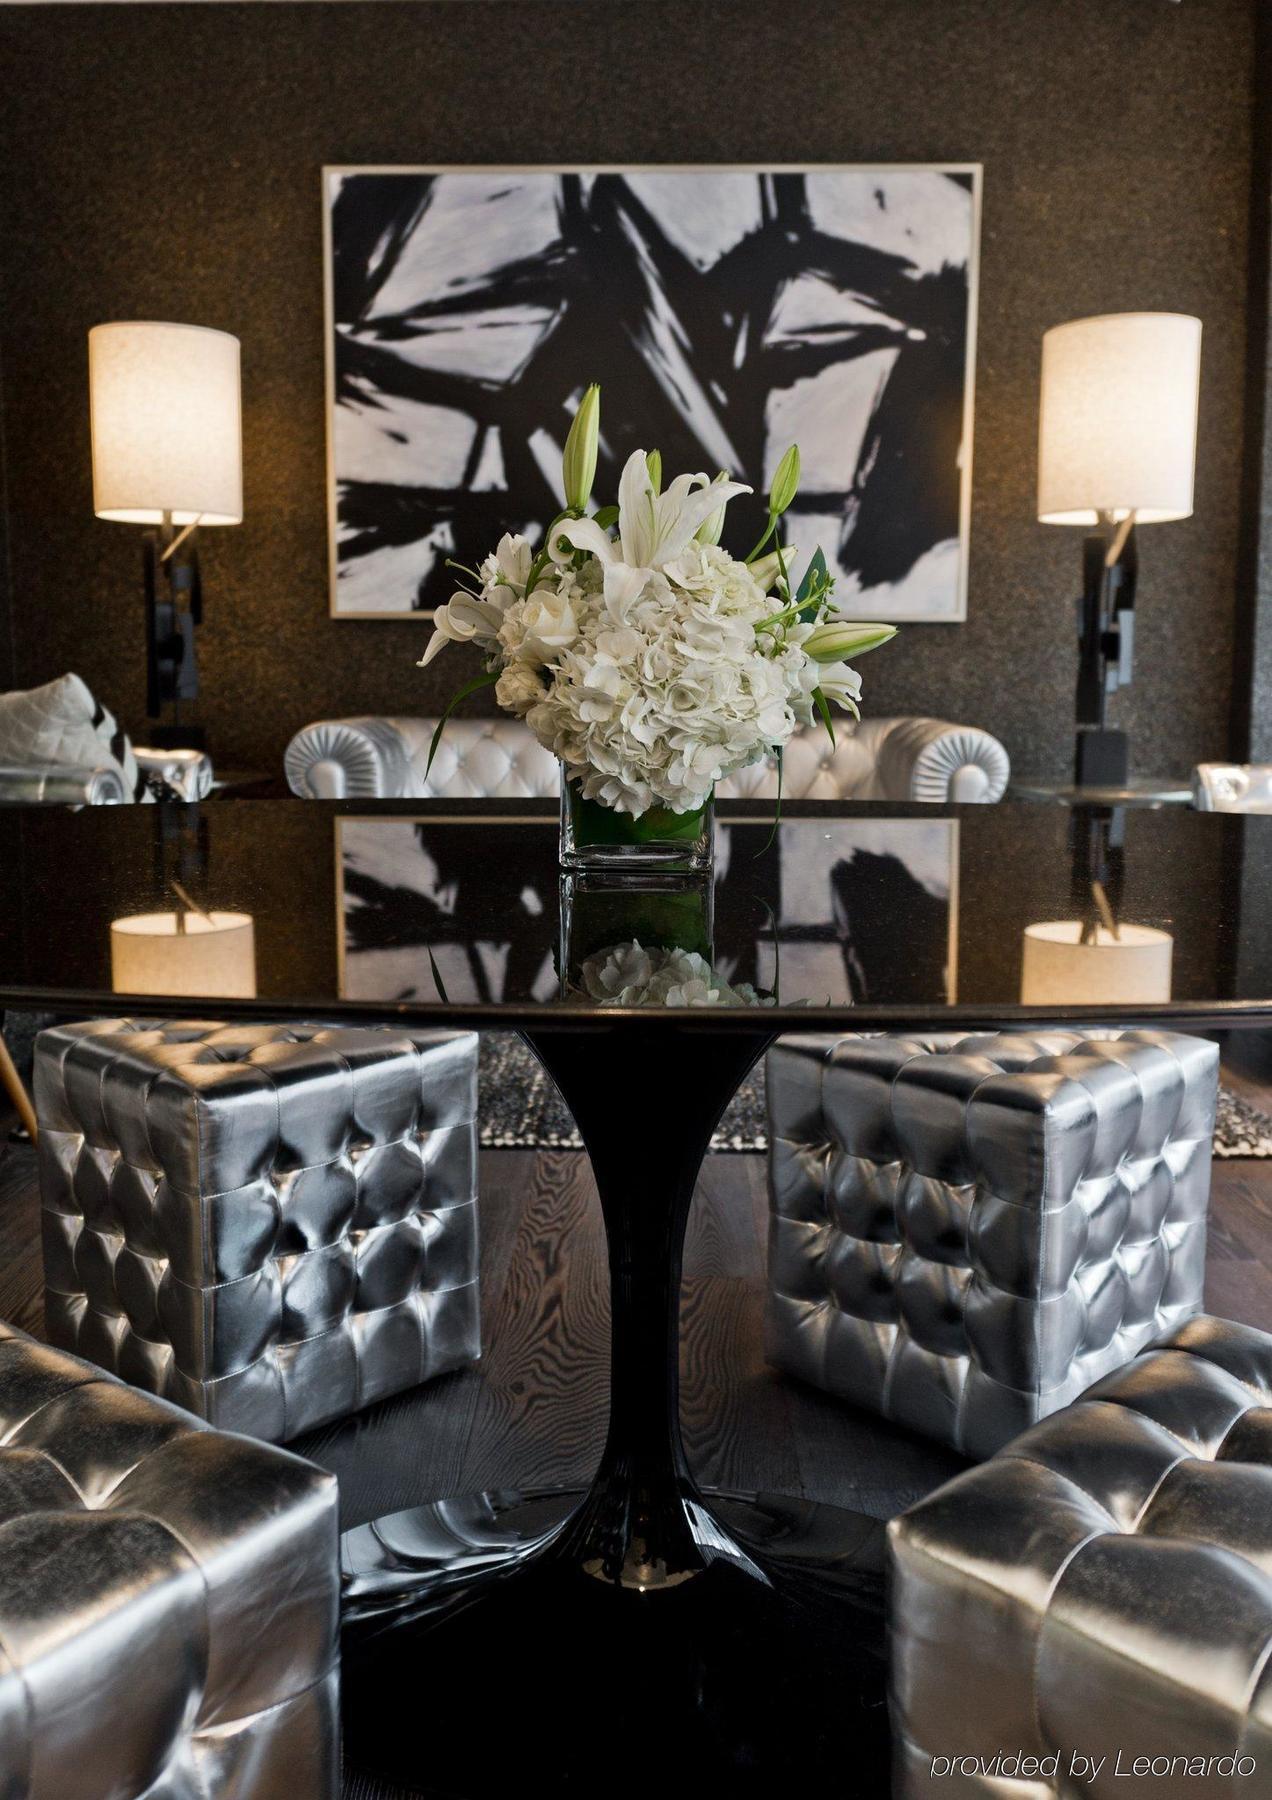 Hotel the moderne, new york city ****